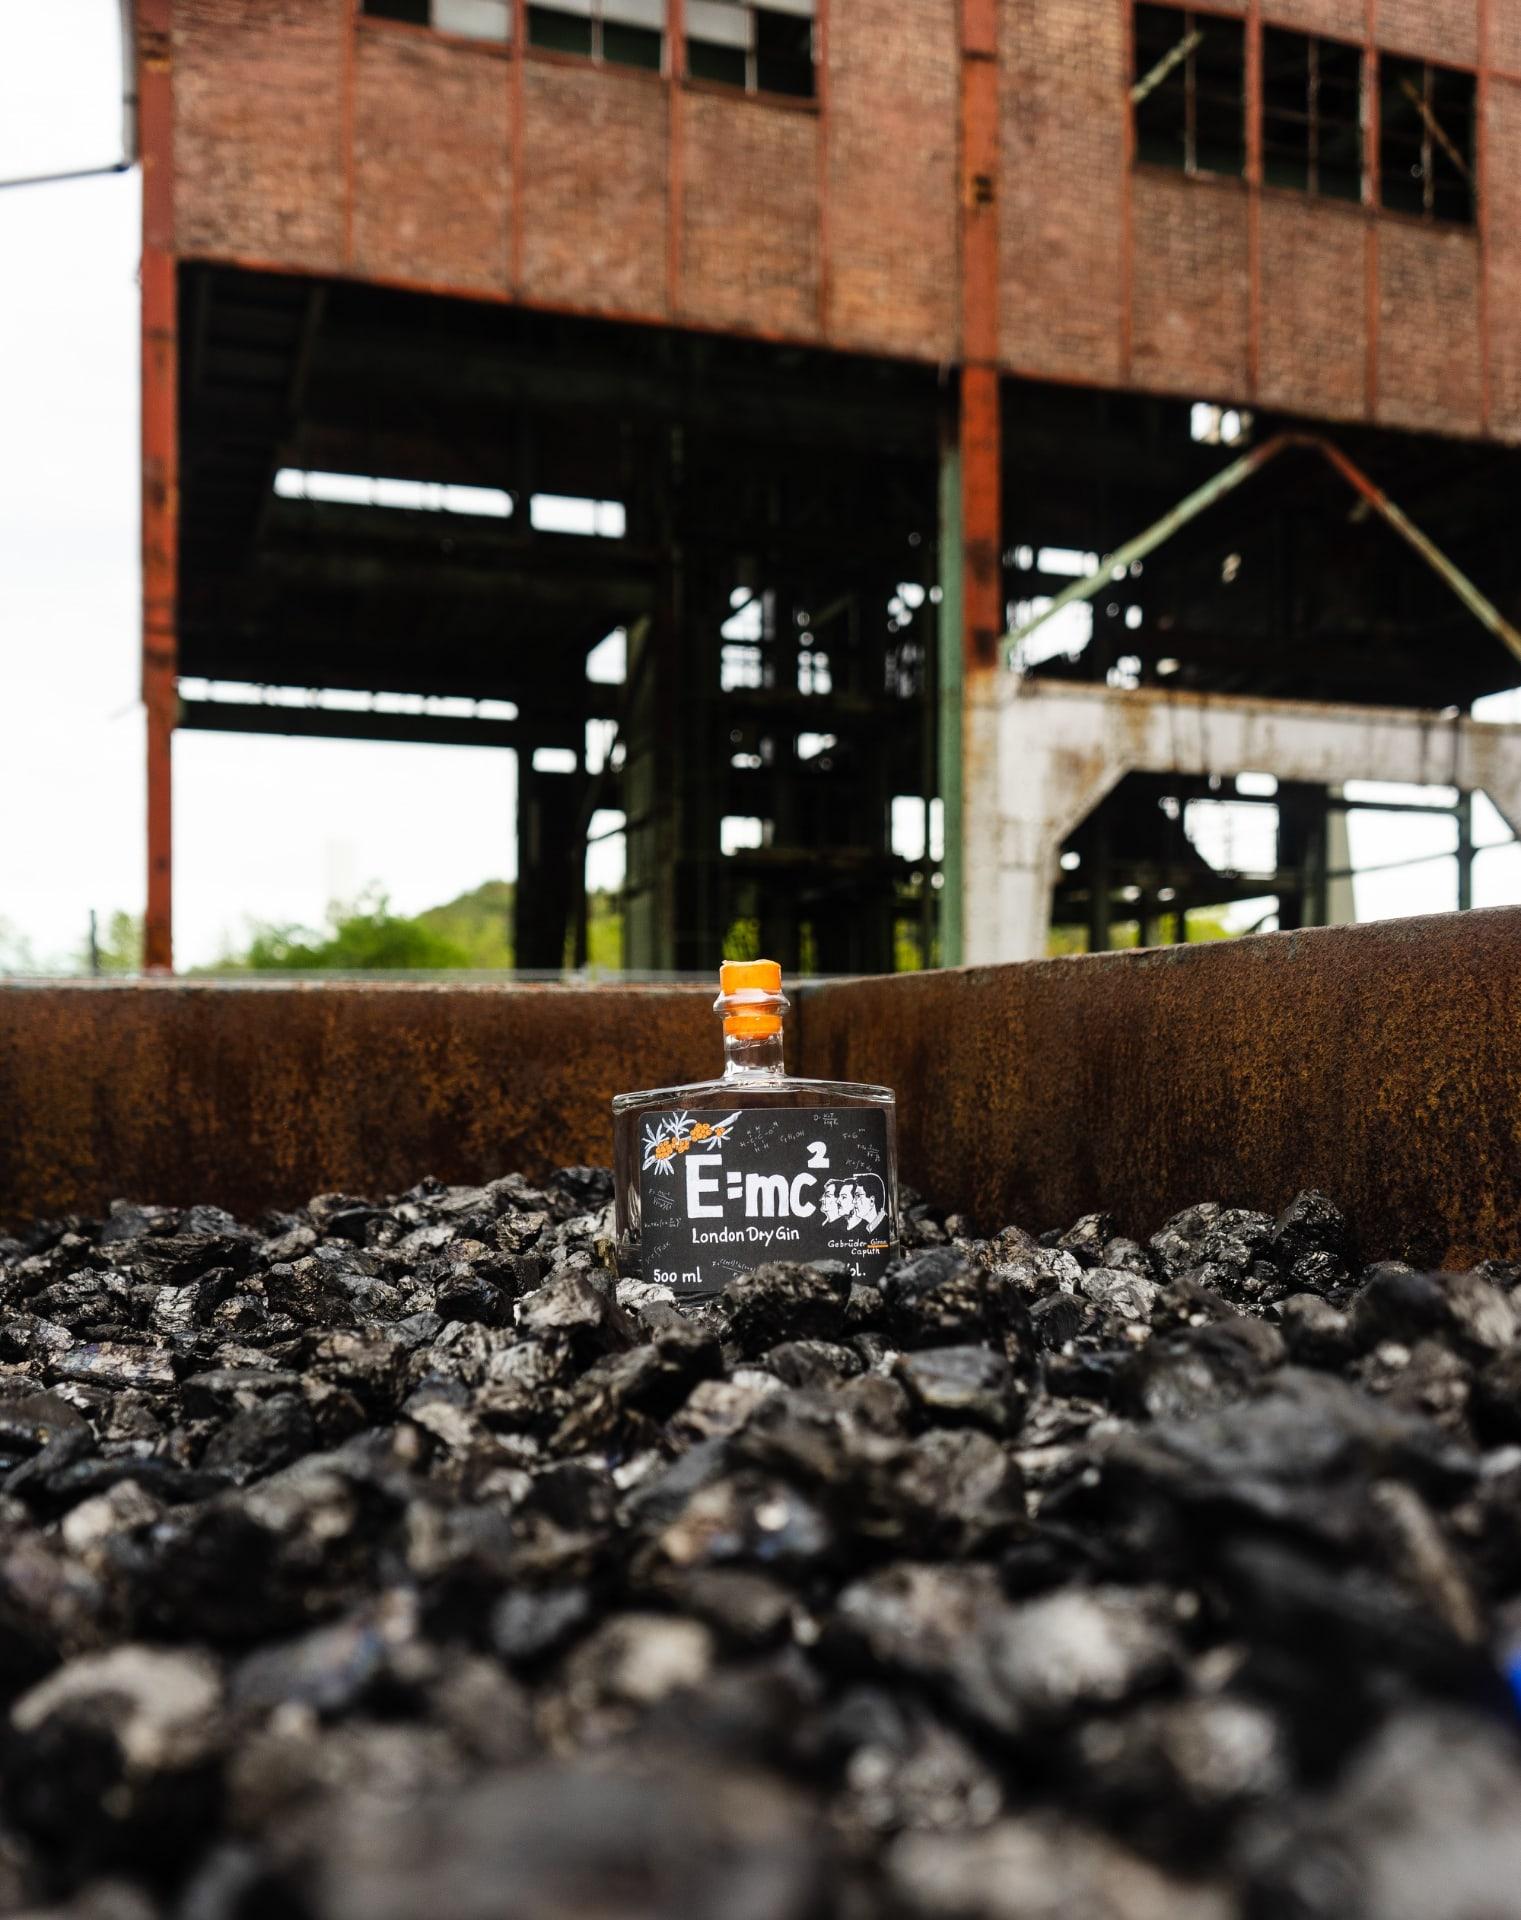 Gin E=mc² in Ruhrpott